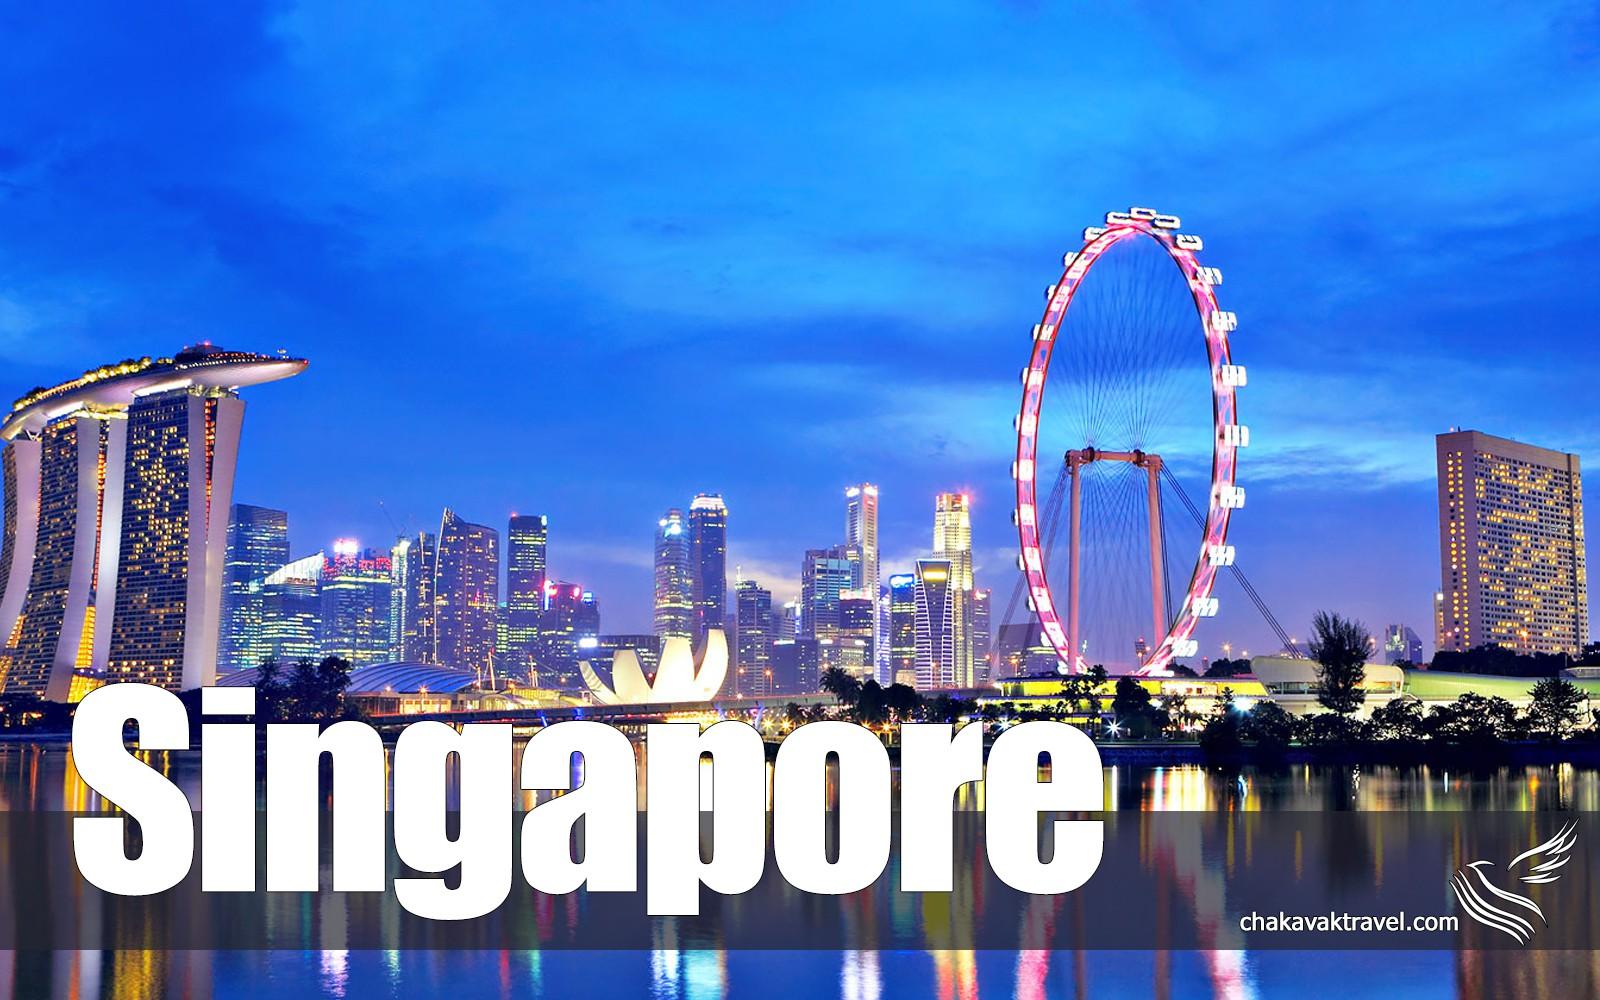 تور سنگاپور رزرو بلیط و هتل در سنگاپور